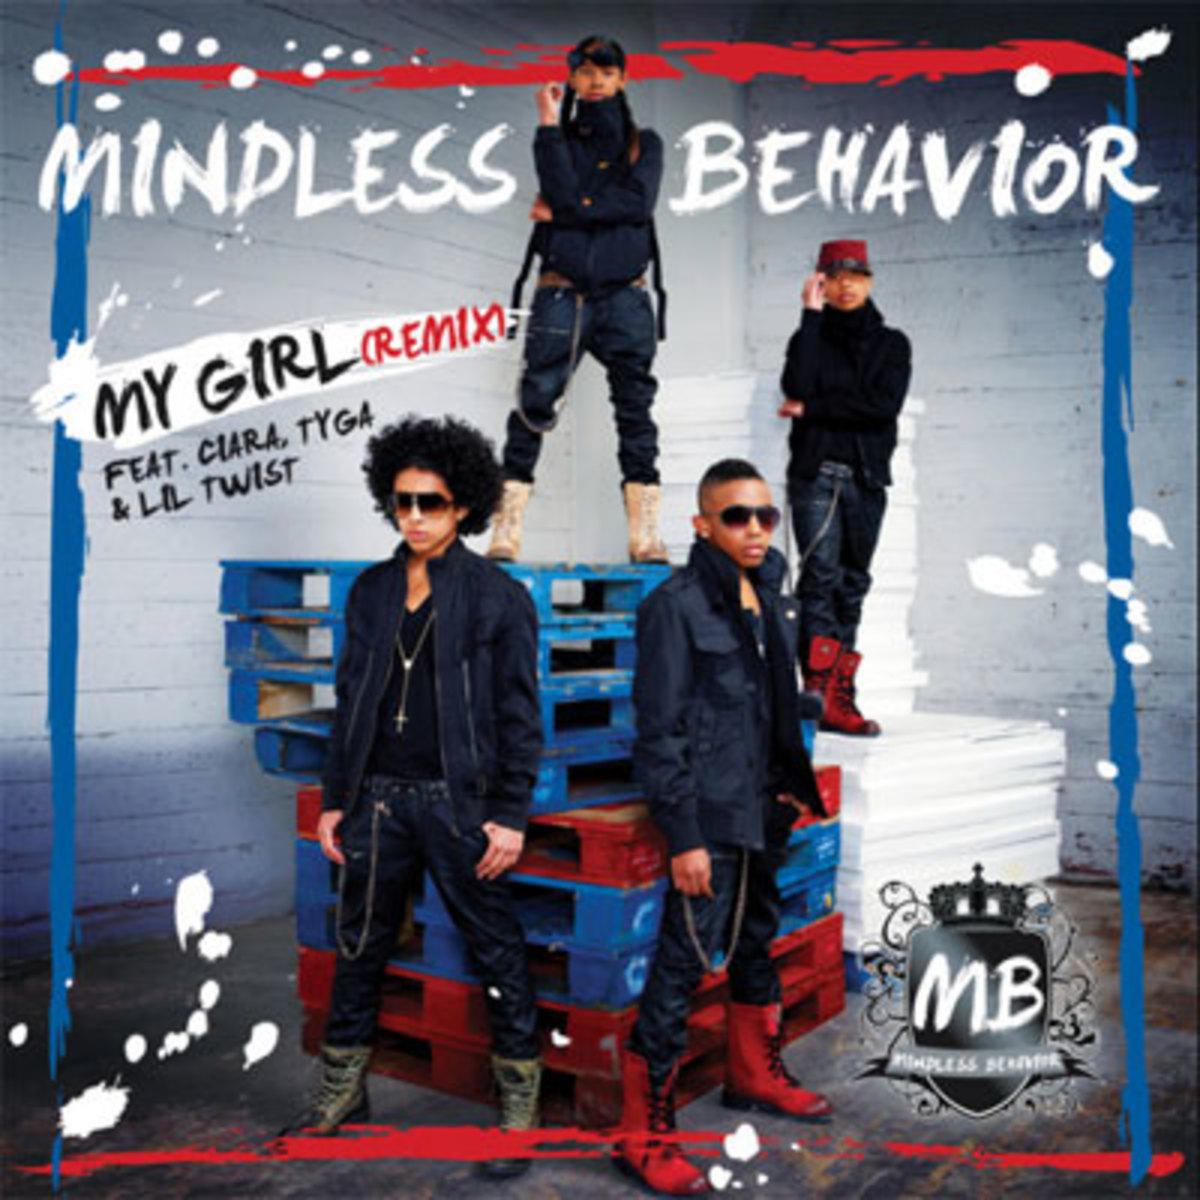 mindlessbehavior-mygirlrmx.jpg